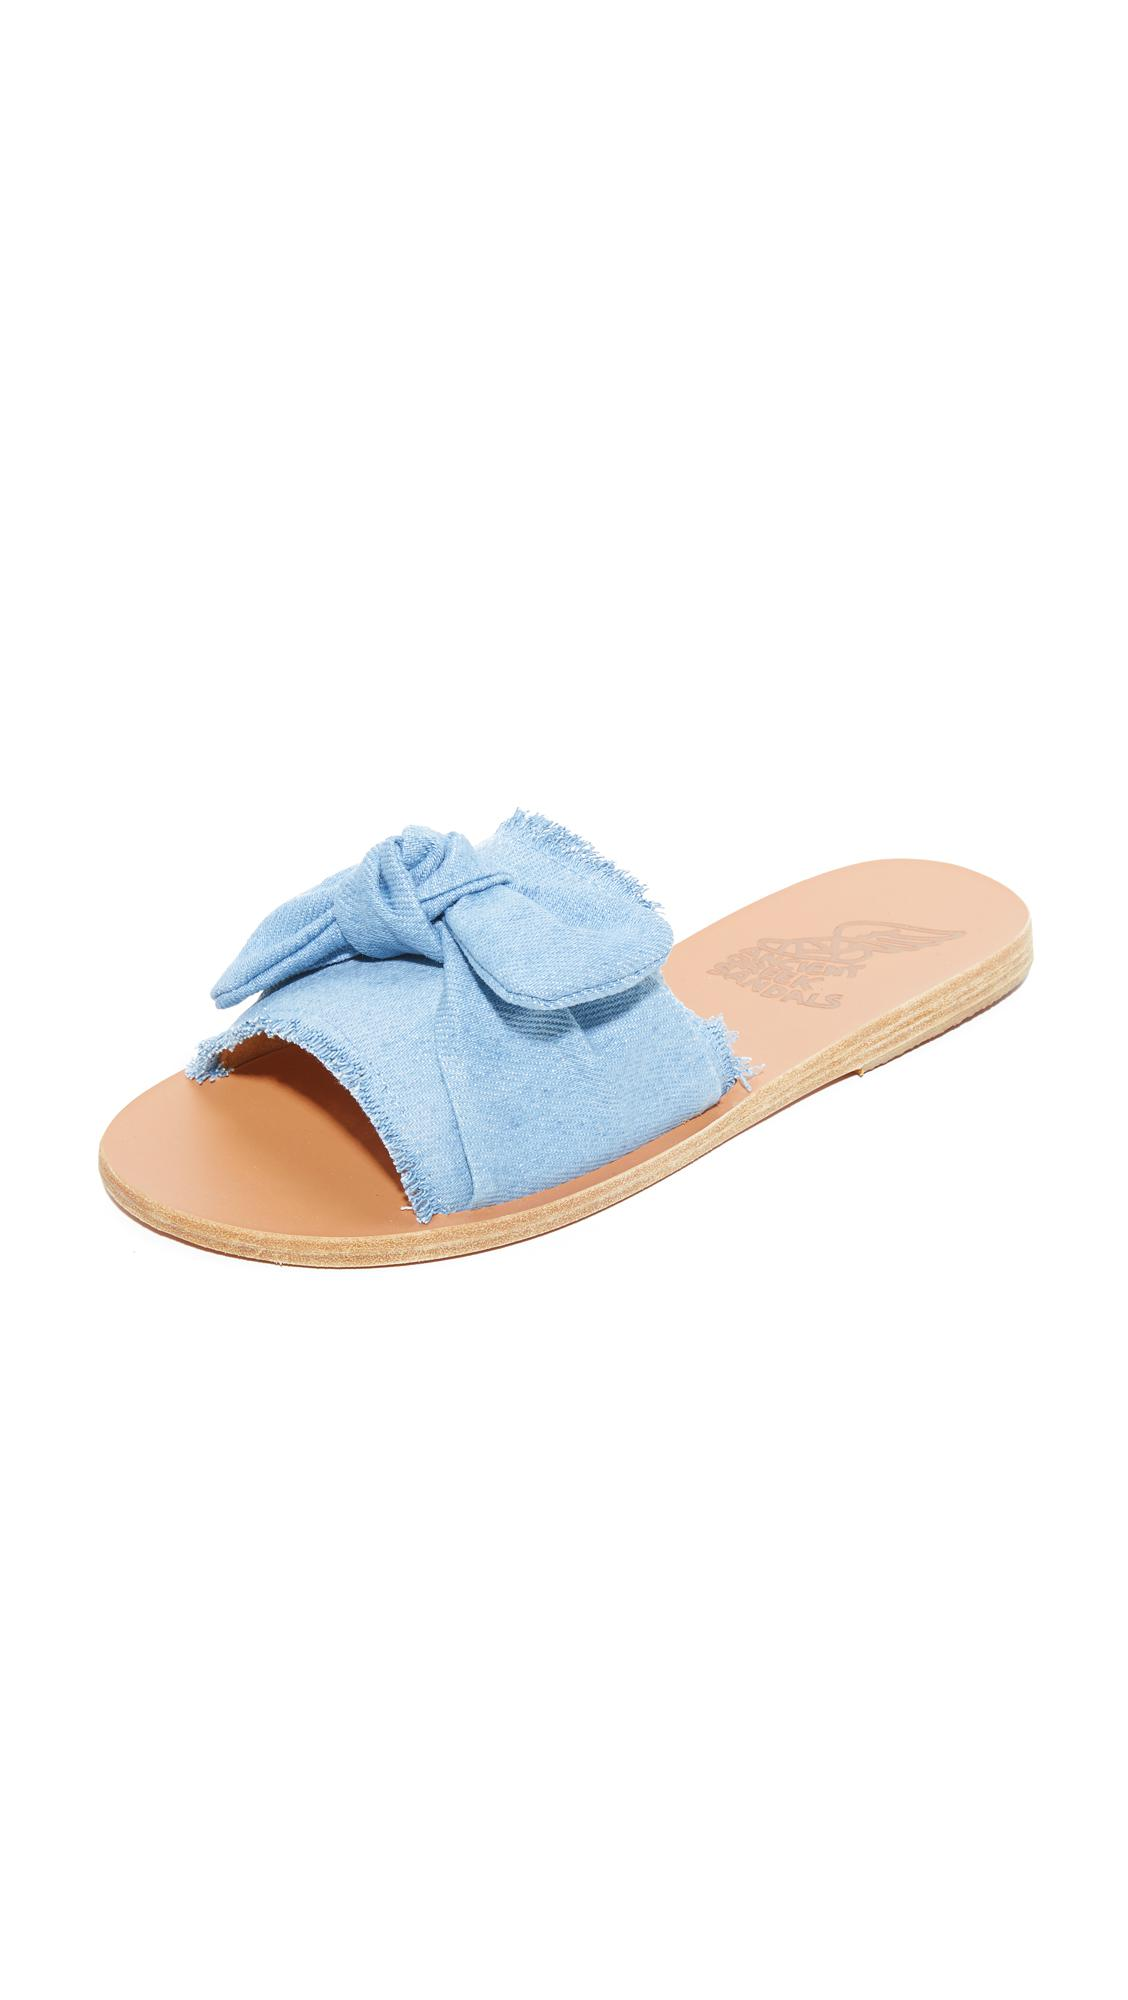 Ancient Greek Sandals Taygete Bow striped sandals Discount Purchase iZQzAuir